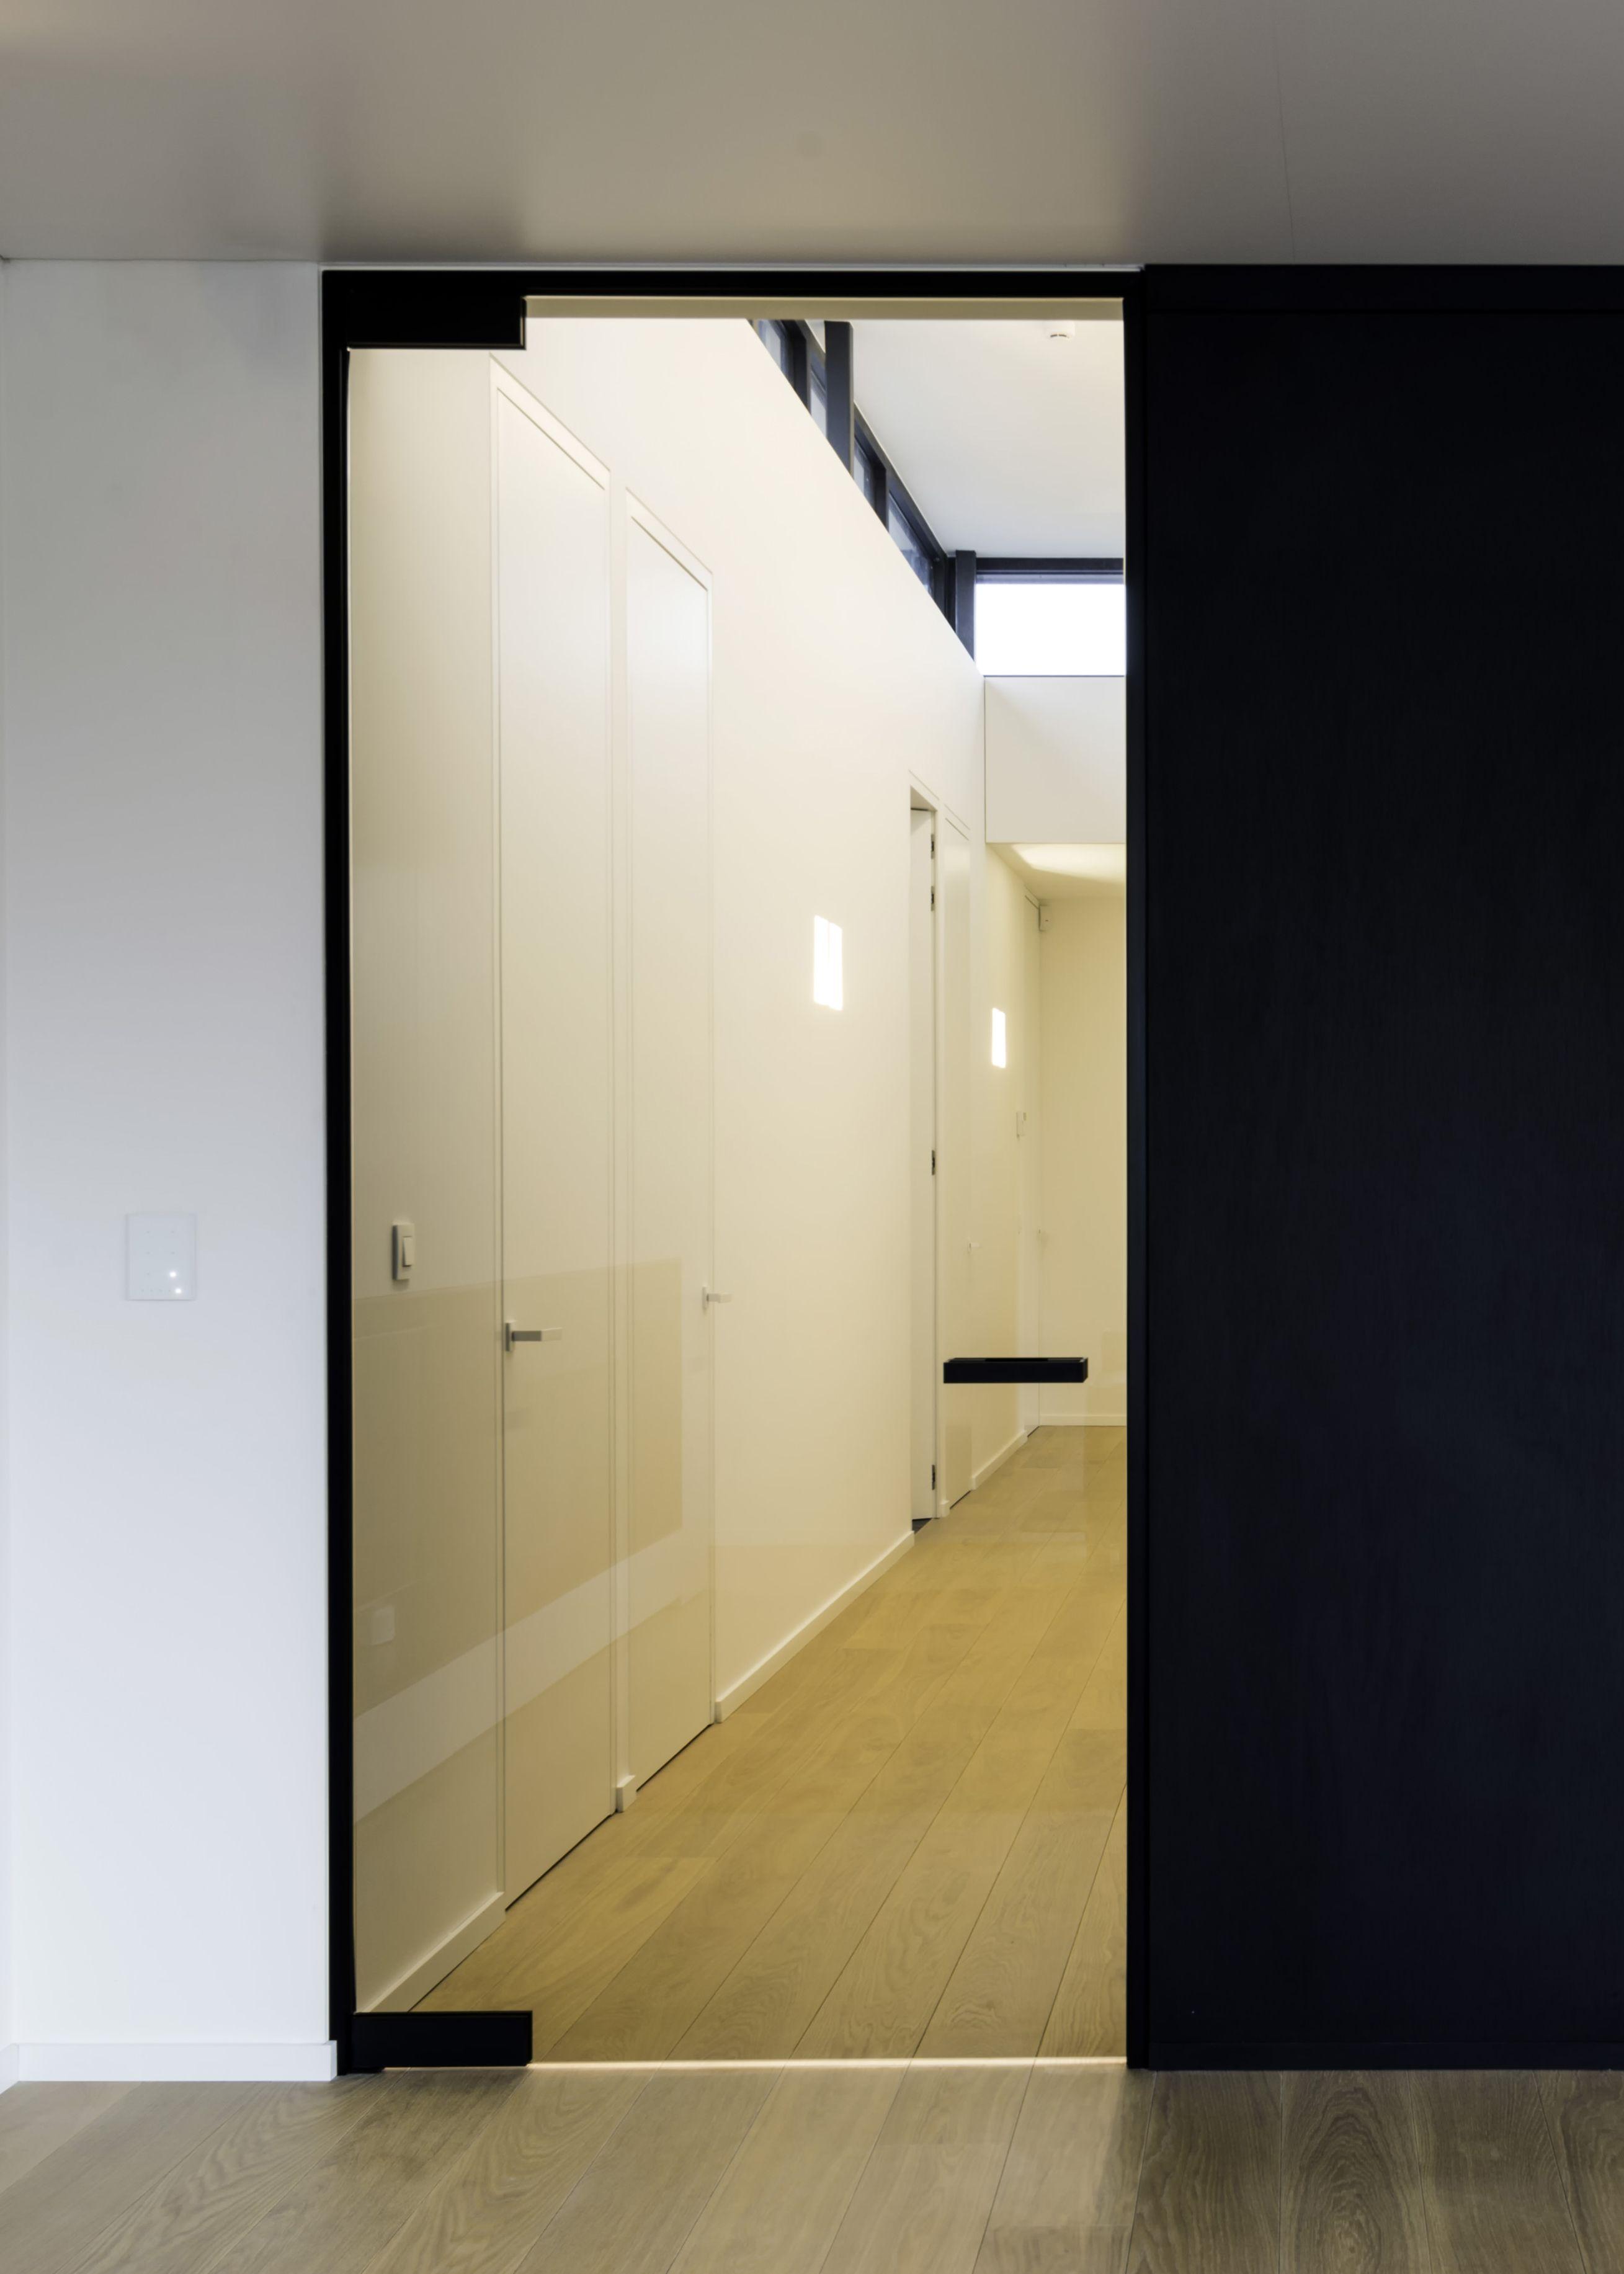 Porte vitr e sur mesure avec charni res noir portes - Porte vitree sur mesure ...